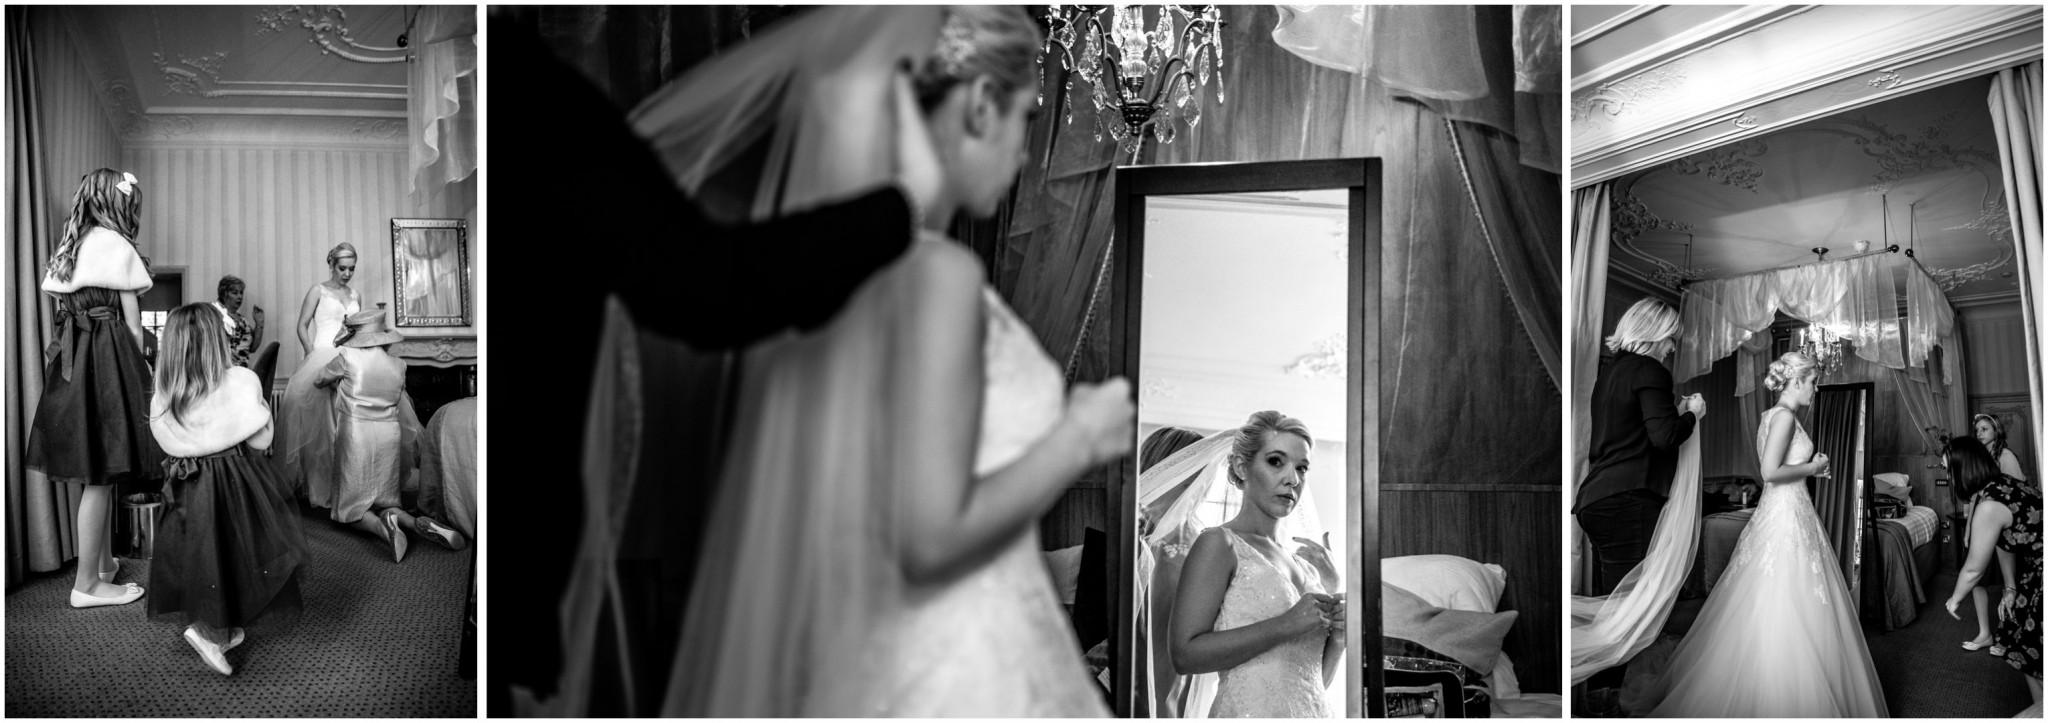 Rhinefield House Wedding Photographer Bride in mirror